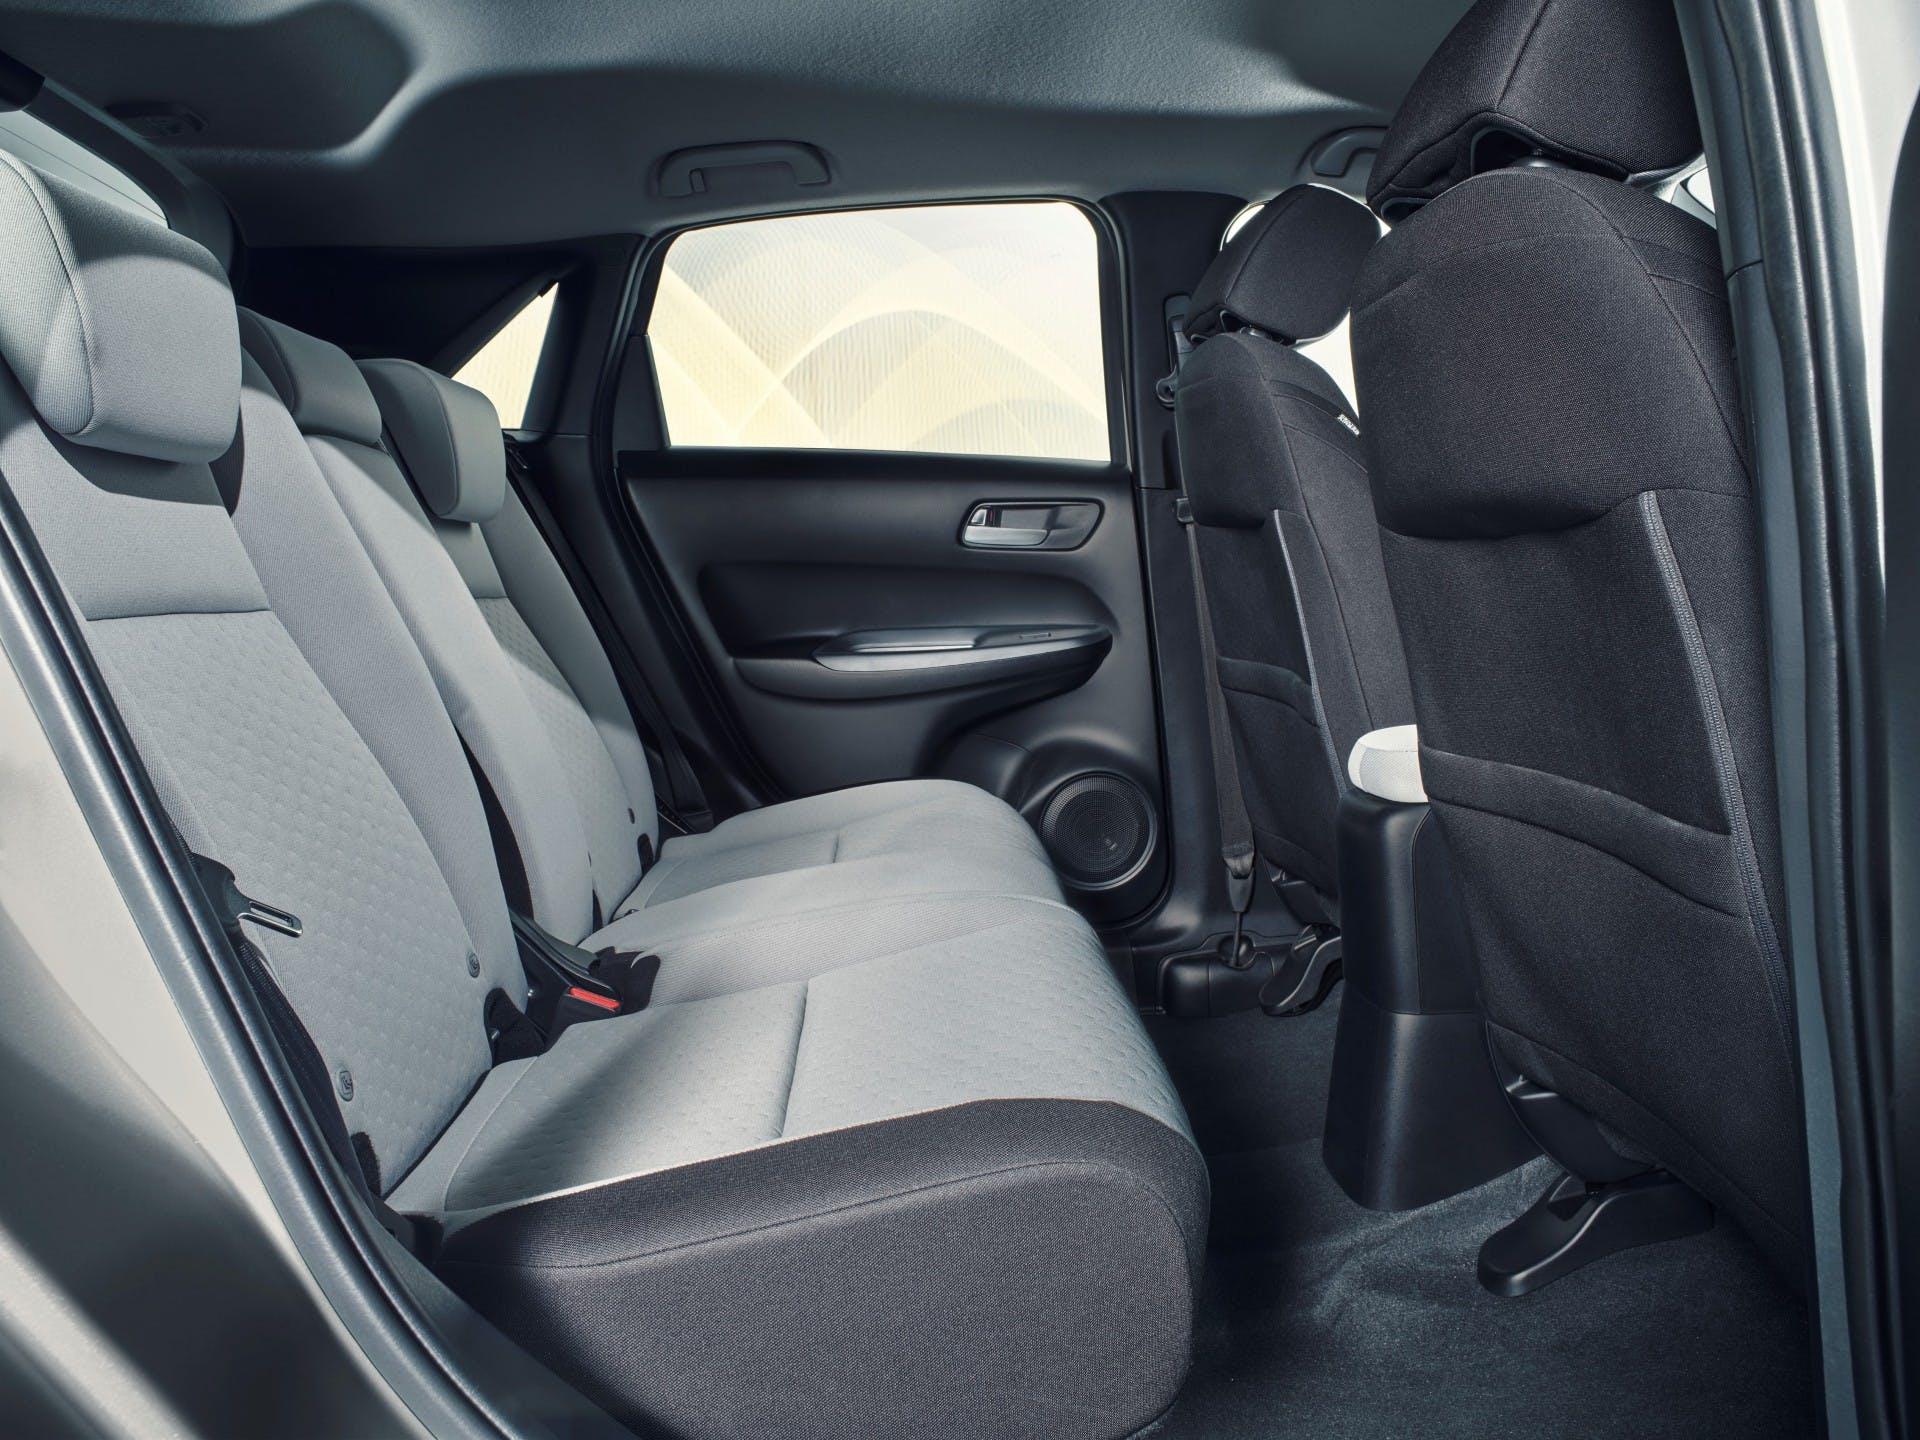 Honda Jazz 2020 Interni divano posteriore